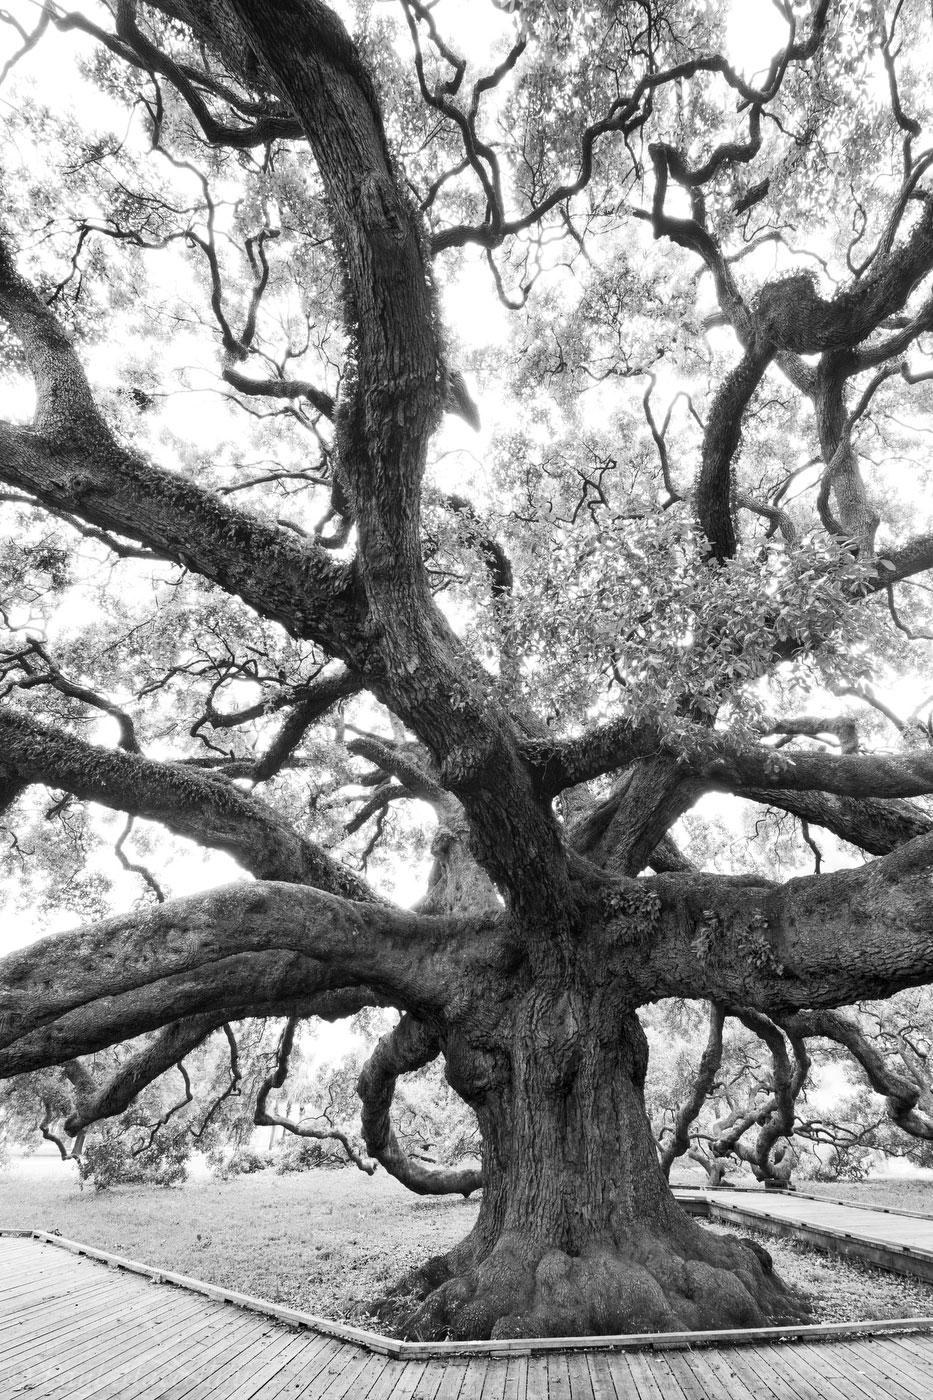 treaty oak, Jacksonville, florida, nature, photography, photo